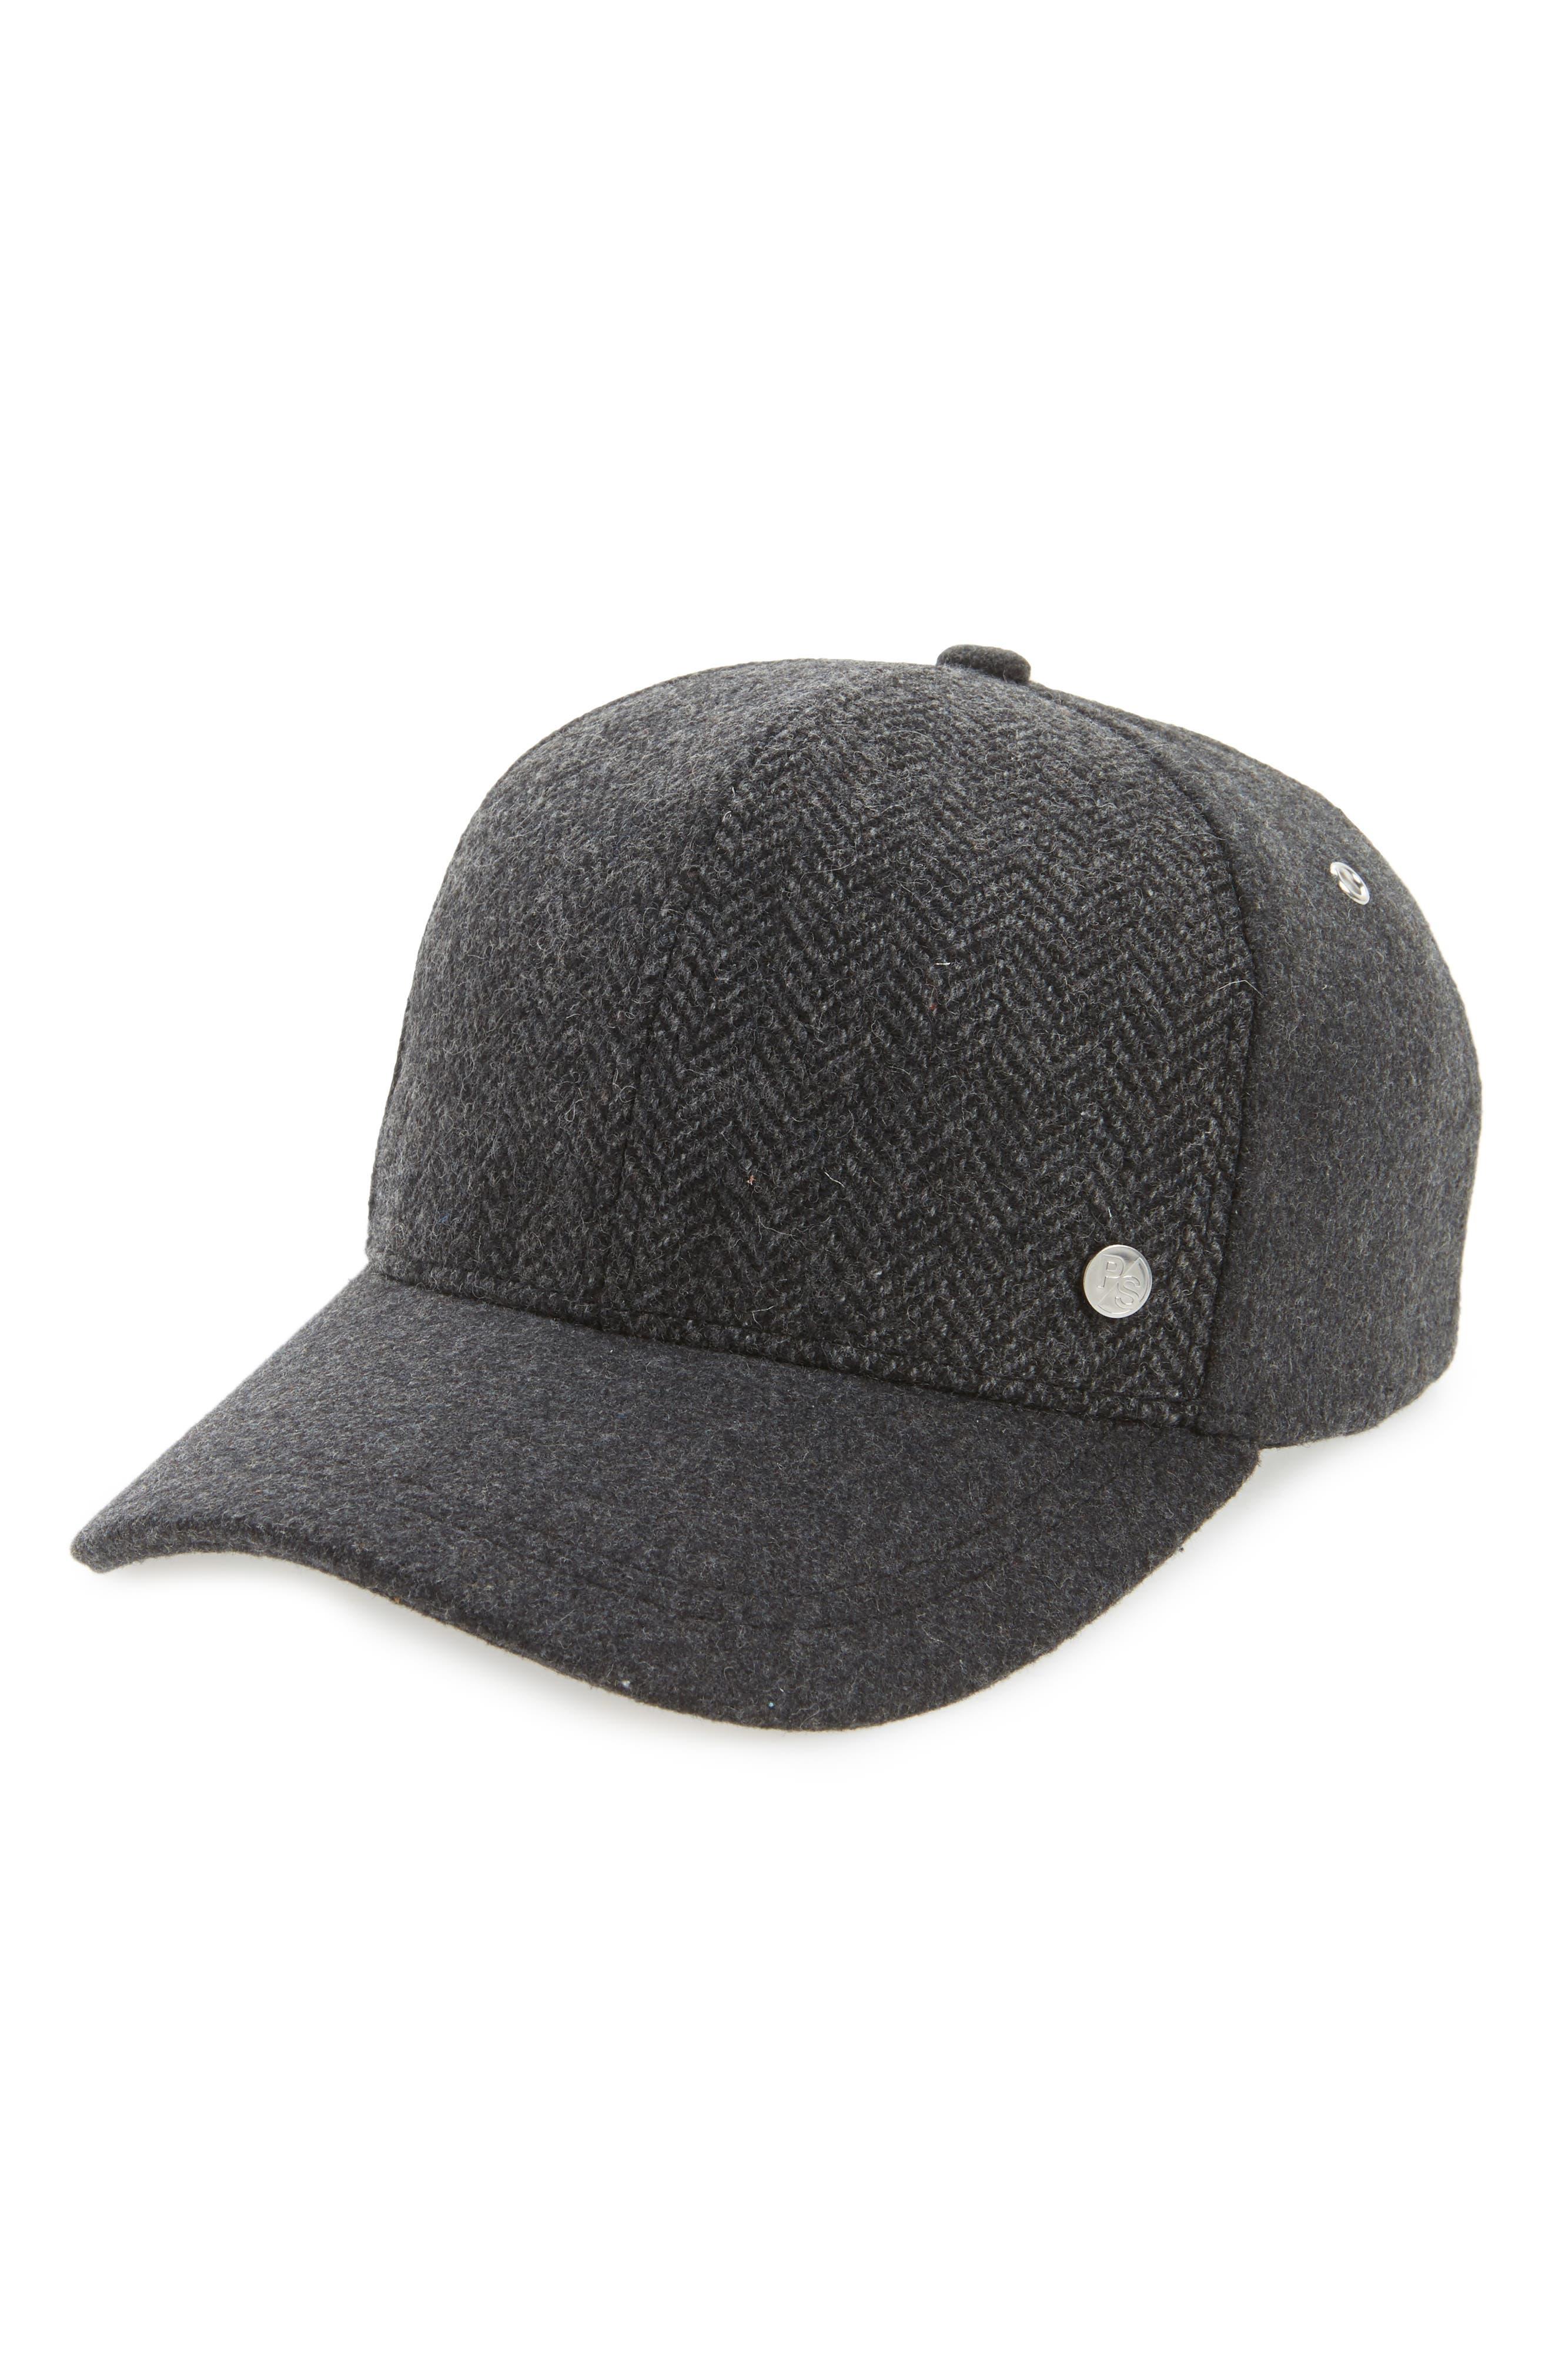 Alternate Image 1 Selected - Paul Smith Herringbone Baseball Cap